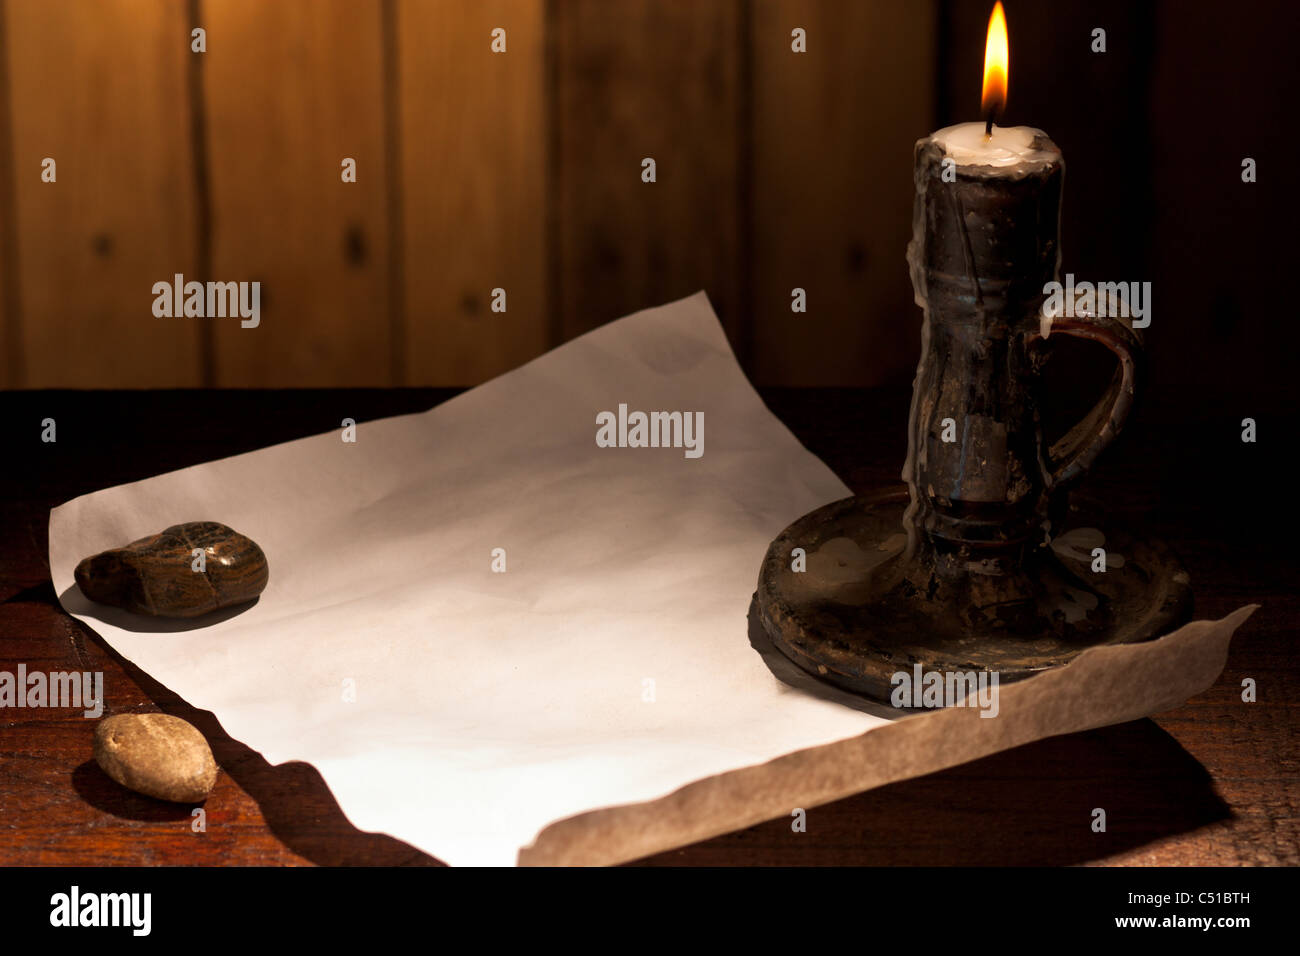 Hoja de papel con vela Imagen De Stock